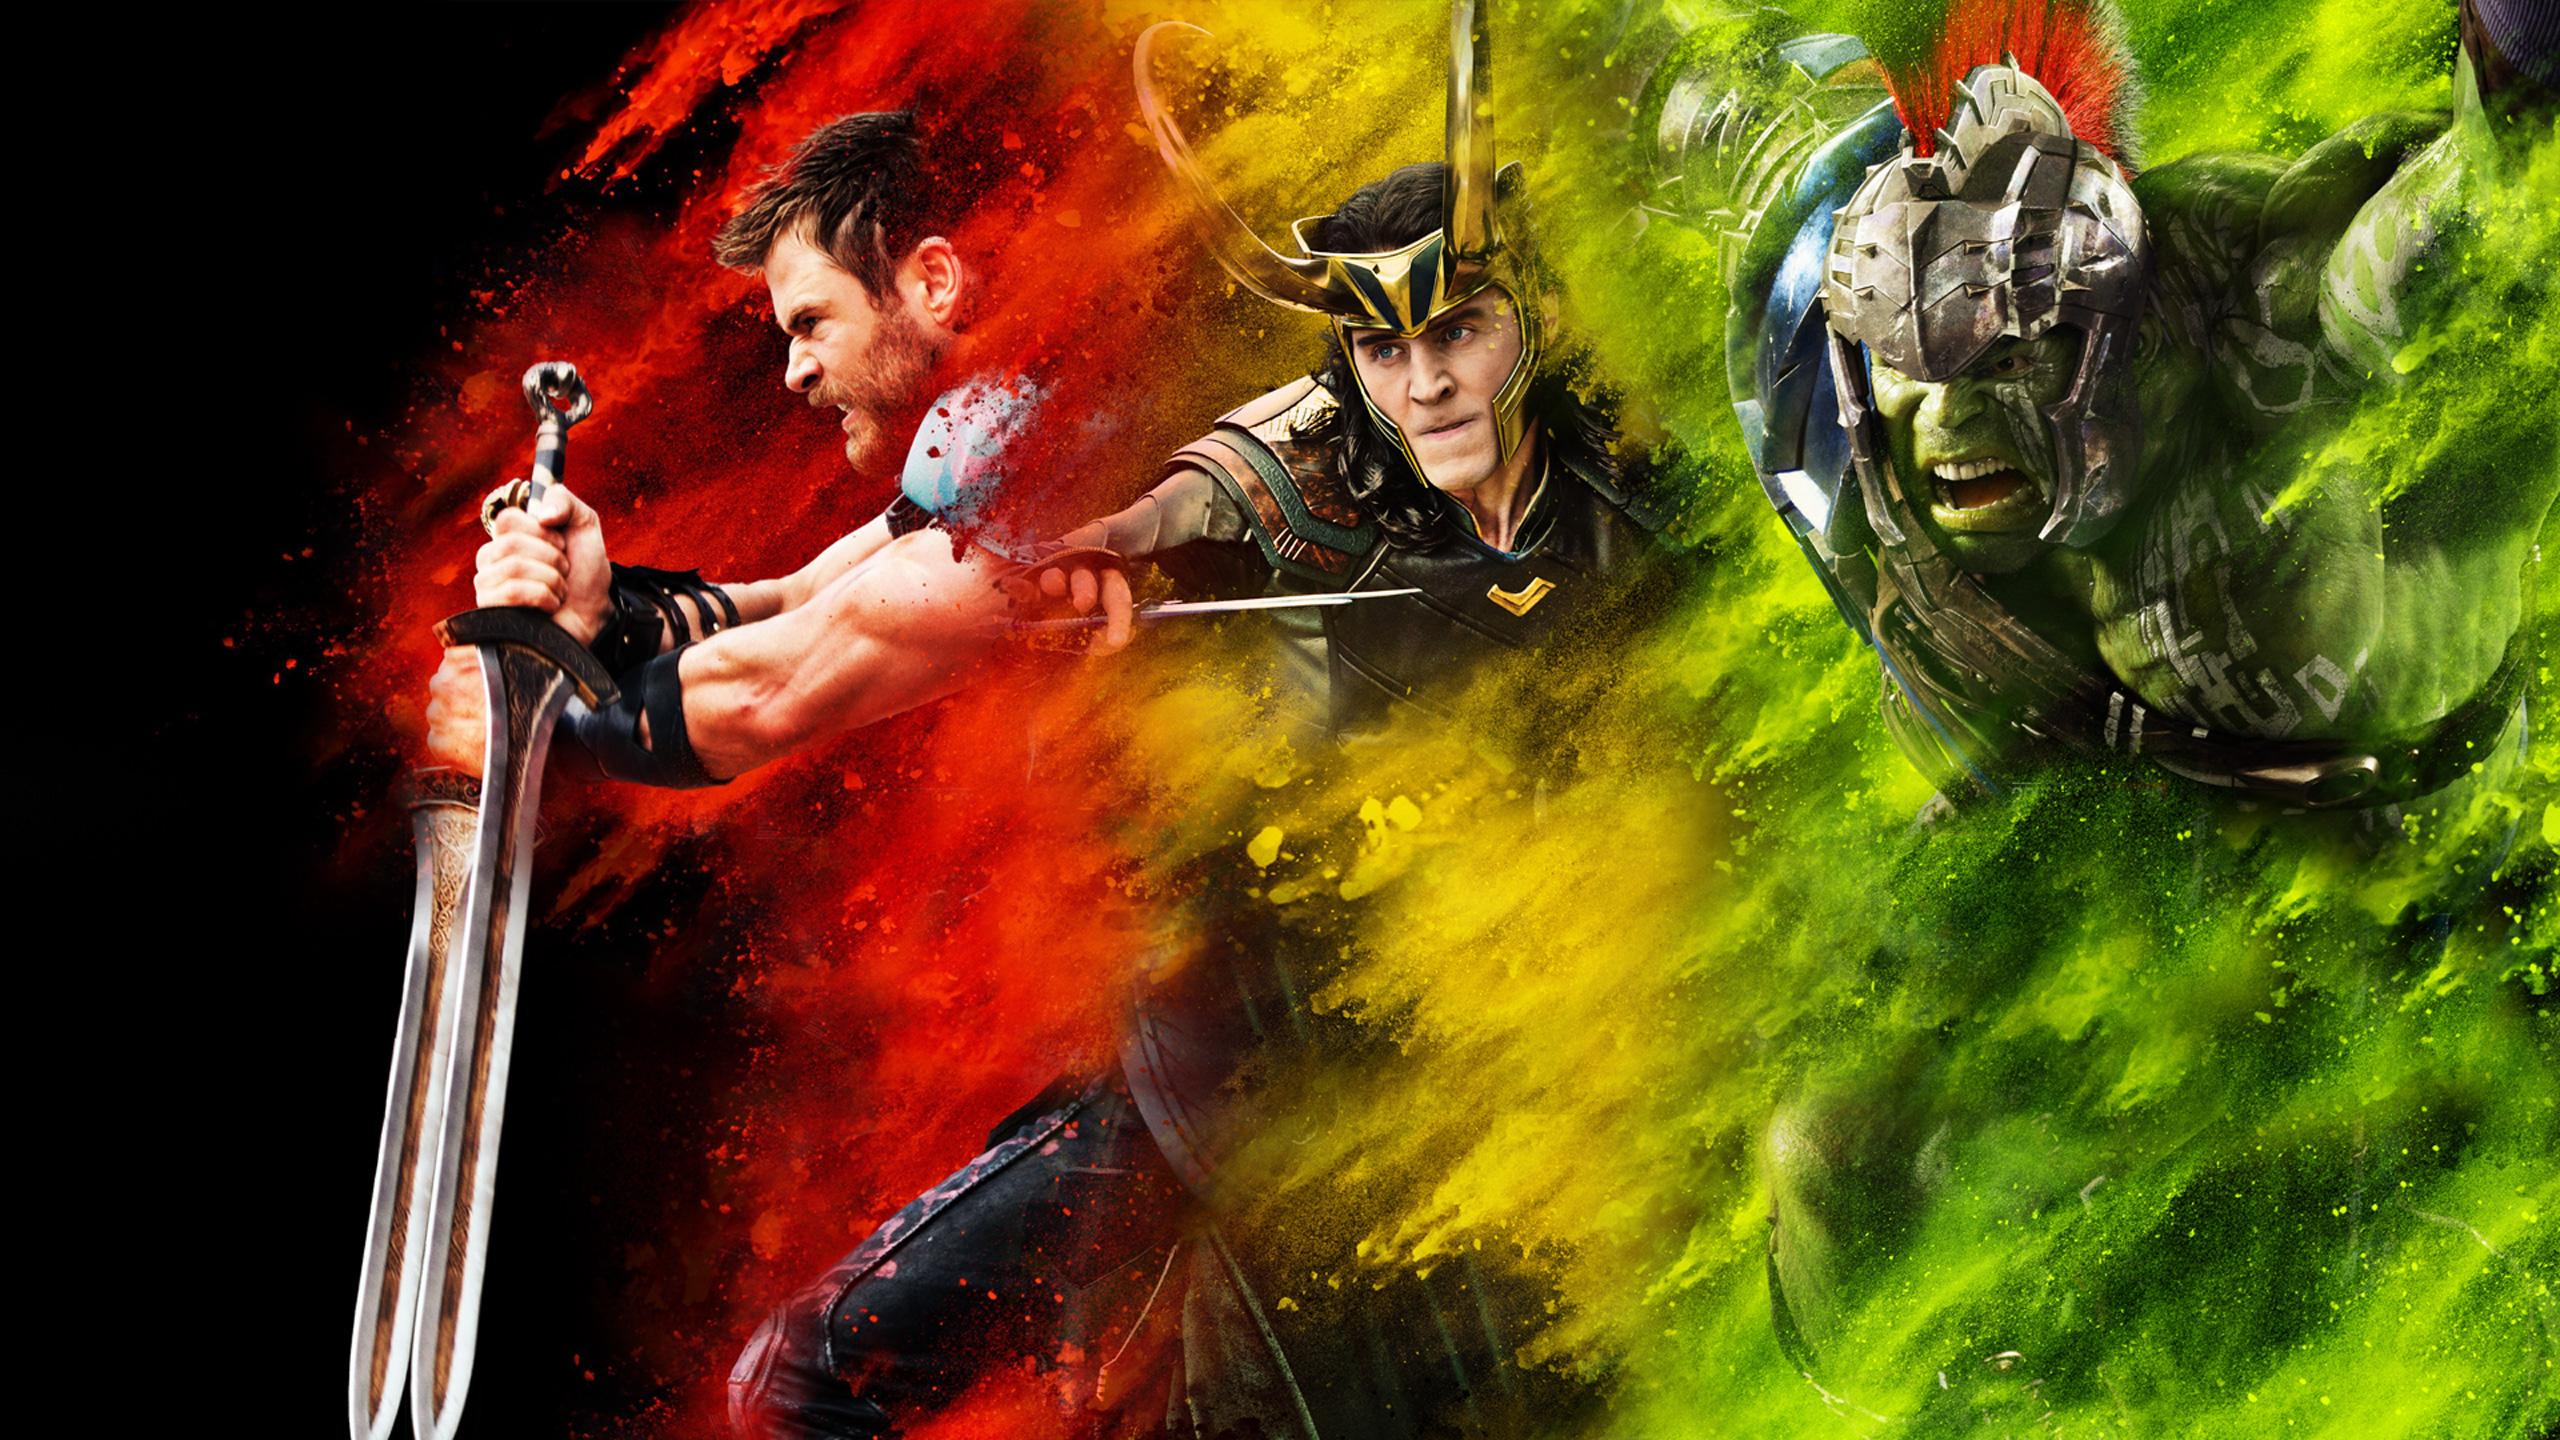 2048x2048 Playerunknowns Battlegrounds 1080p Ipad Air Hd: 2048x2048 Thor Loki Hulk Thor Ragnarok Ipad Air HD 4k